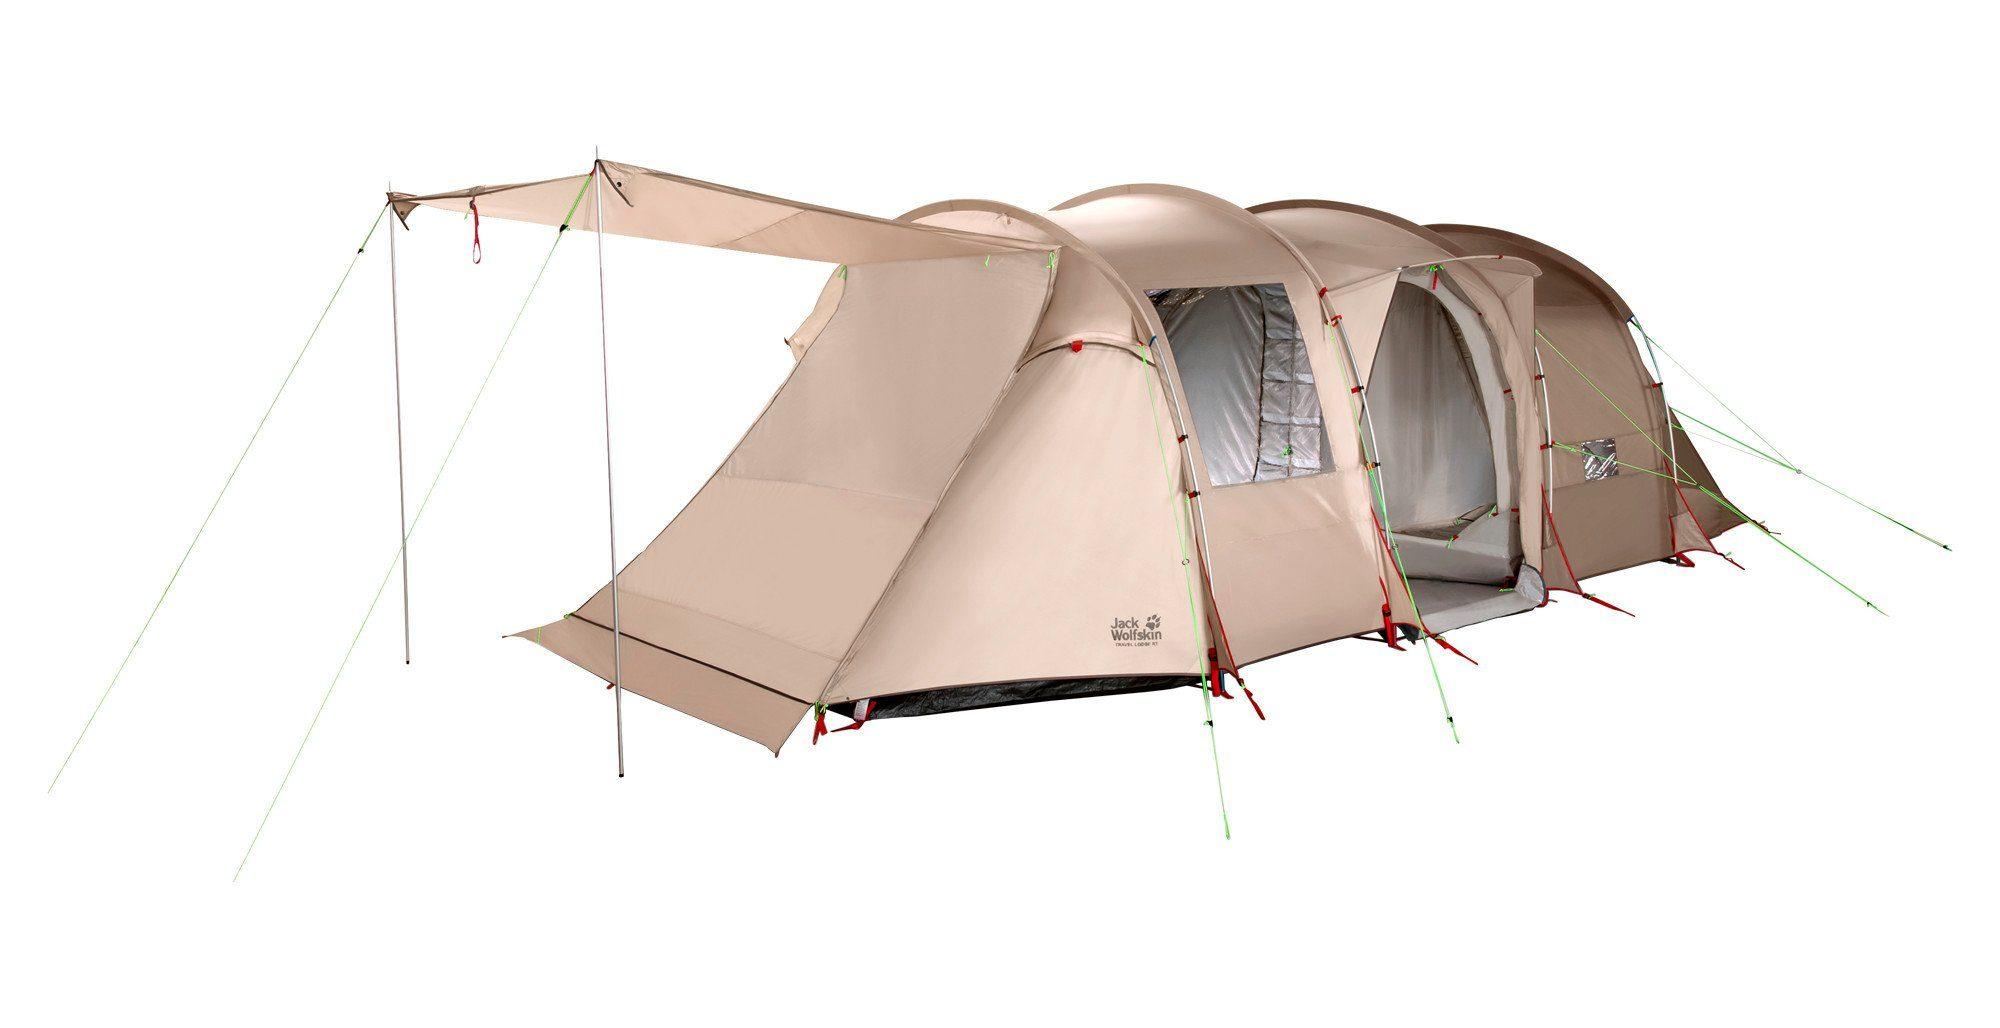 Jack Wolfskin Zelt »Travel Lodge RT Tent«